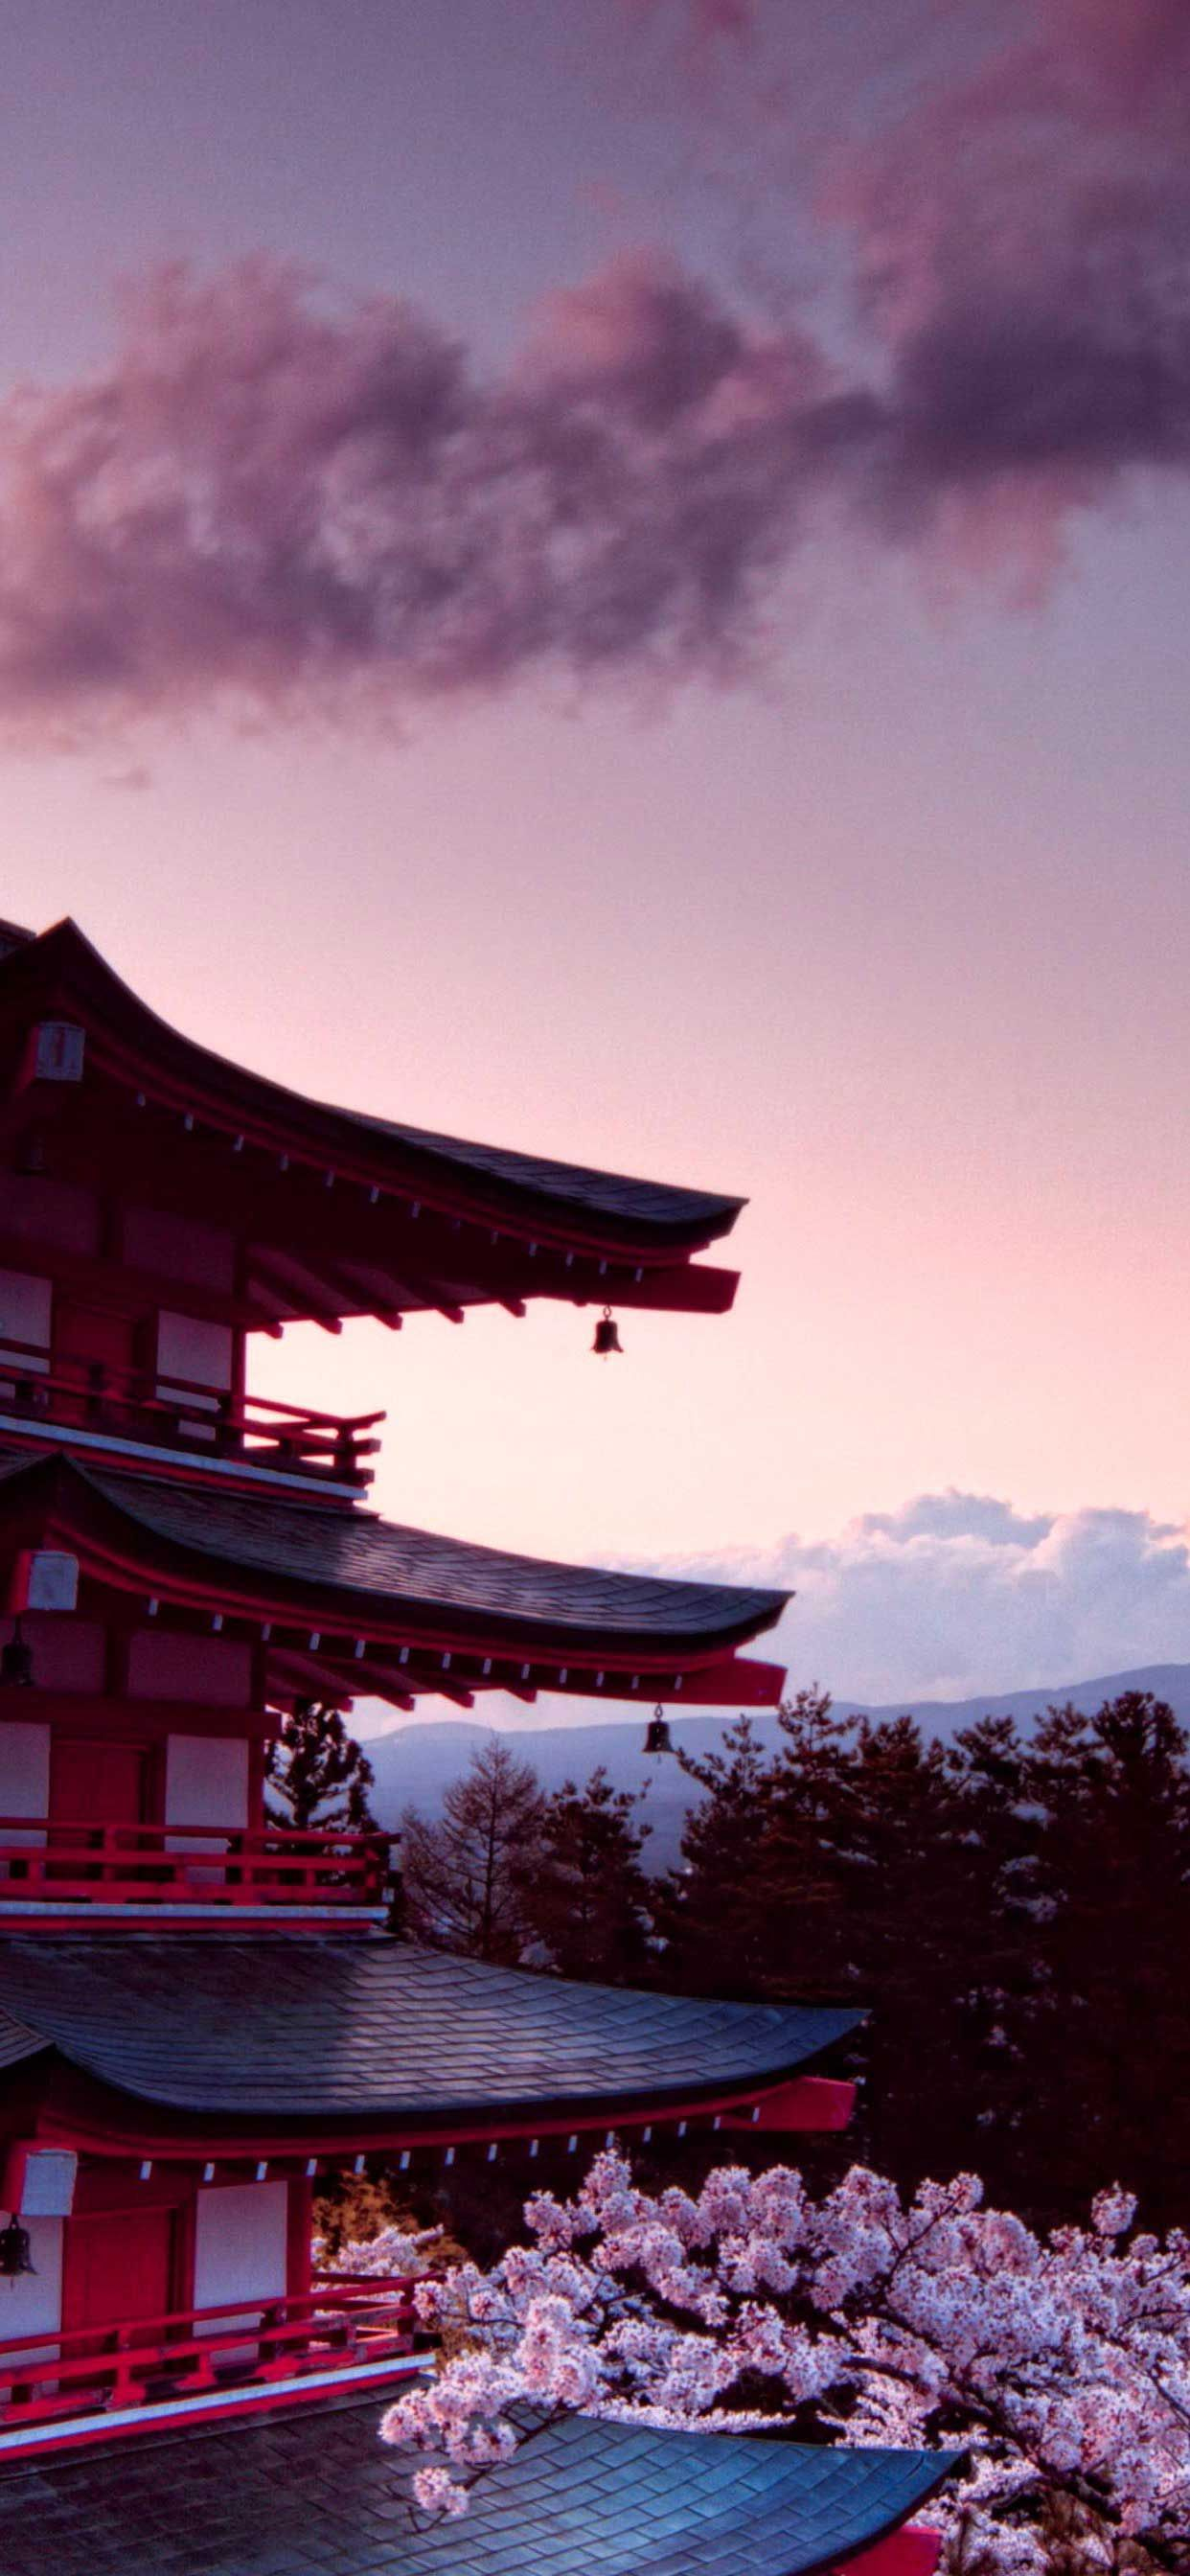 Churei Tower Mount Fuji In Japan K Iphone Pro Ma Wallpaper In 2020 Iphone Wallpaper Japan Japanese Wallpaper Iphone Savage Wallpapers